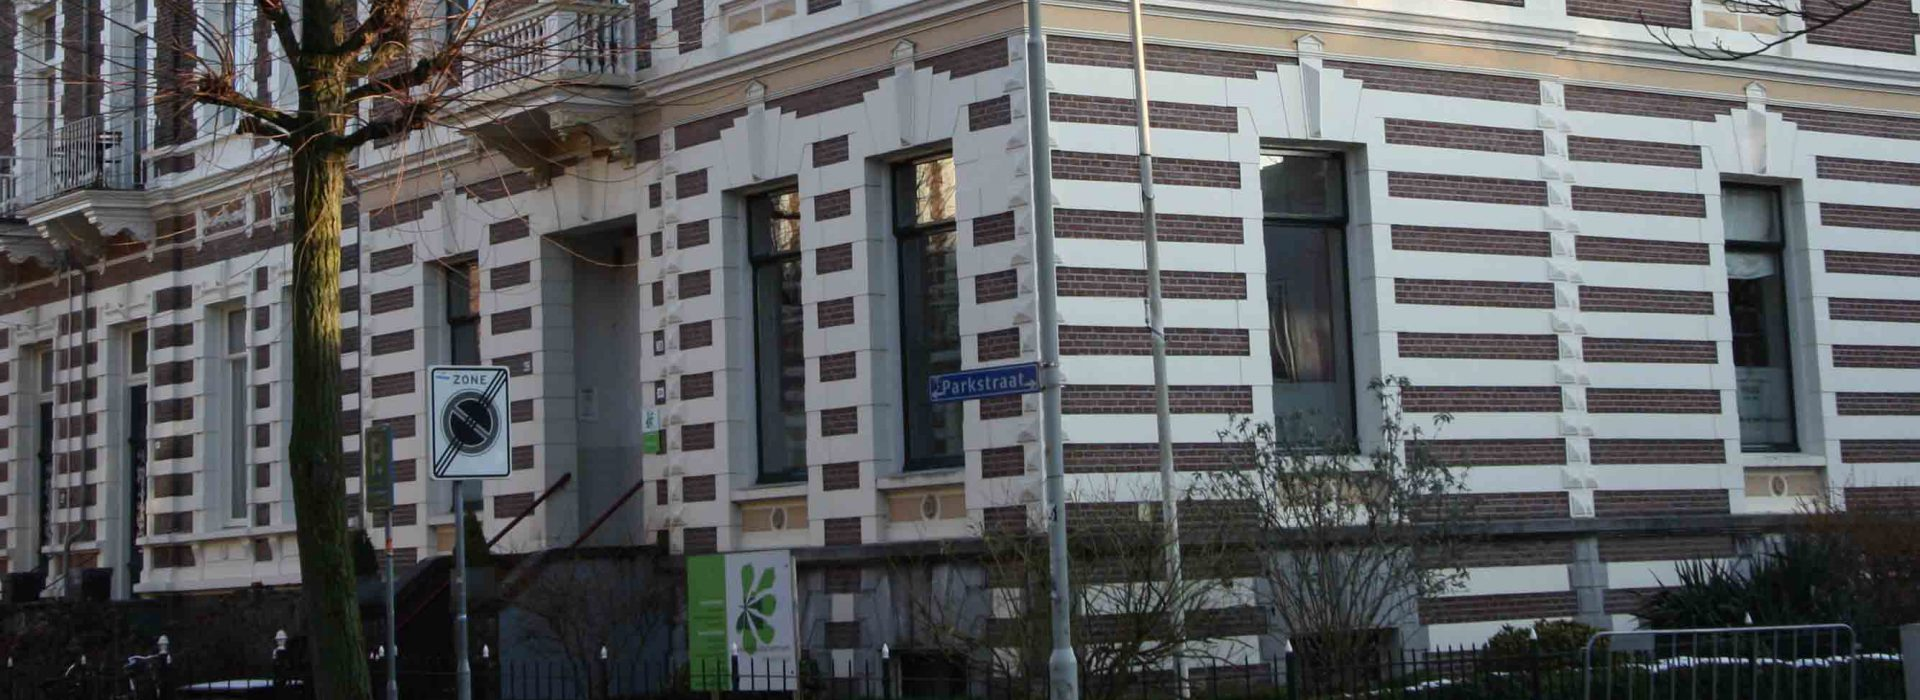 Gezondheidscentrum Parkstraat Arnhem